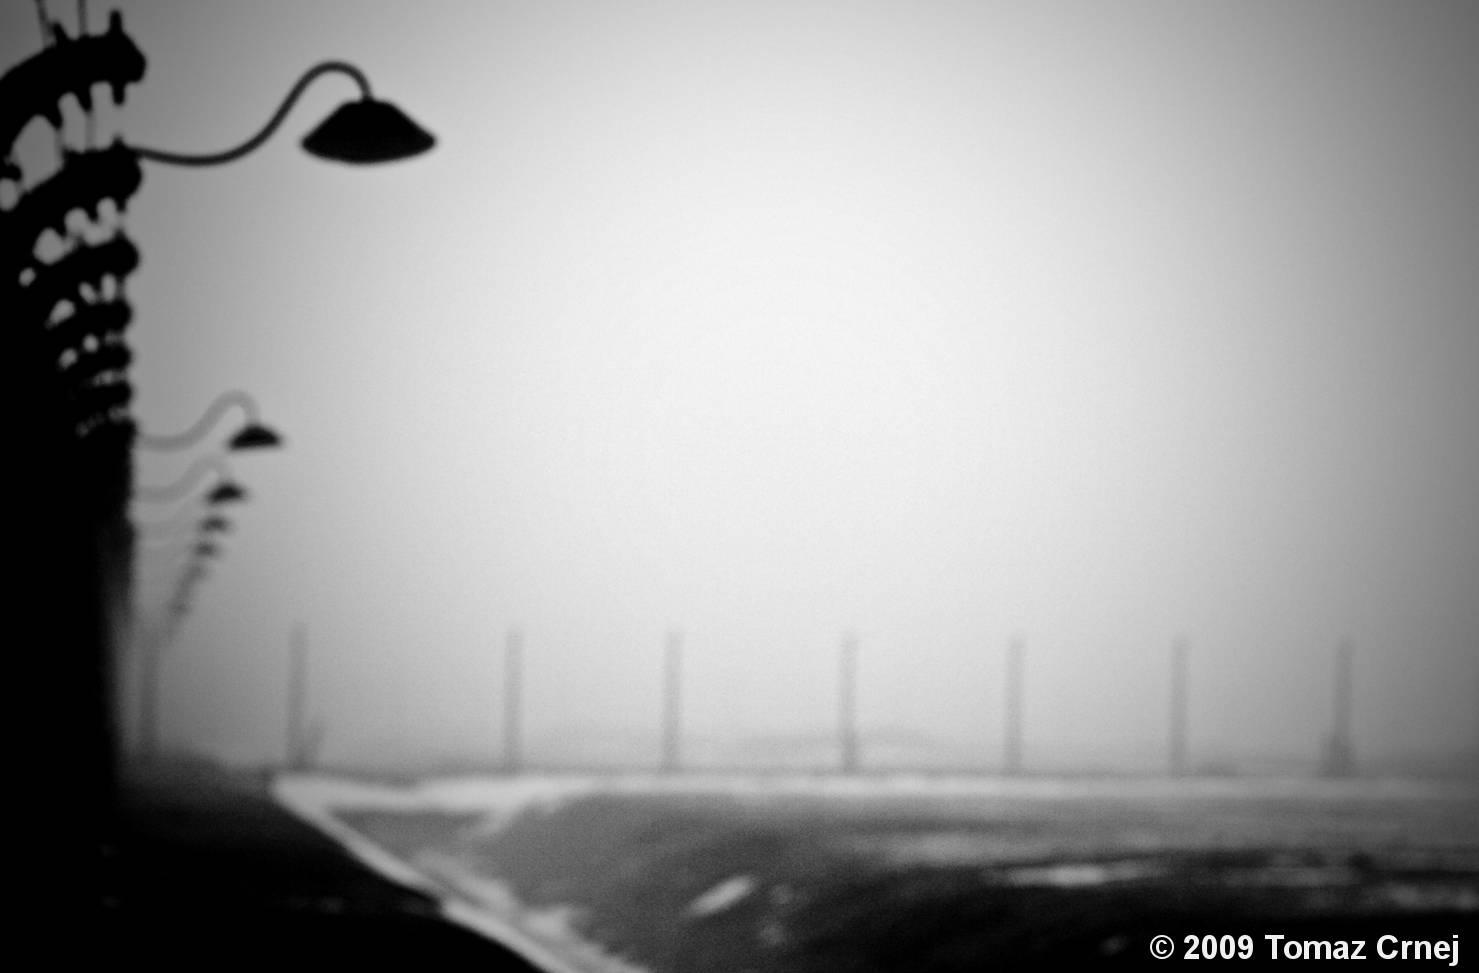 My sad landscape 2 photo & image | Special, Monochrome Fine Art ...